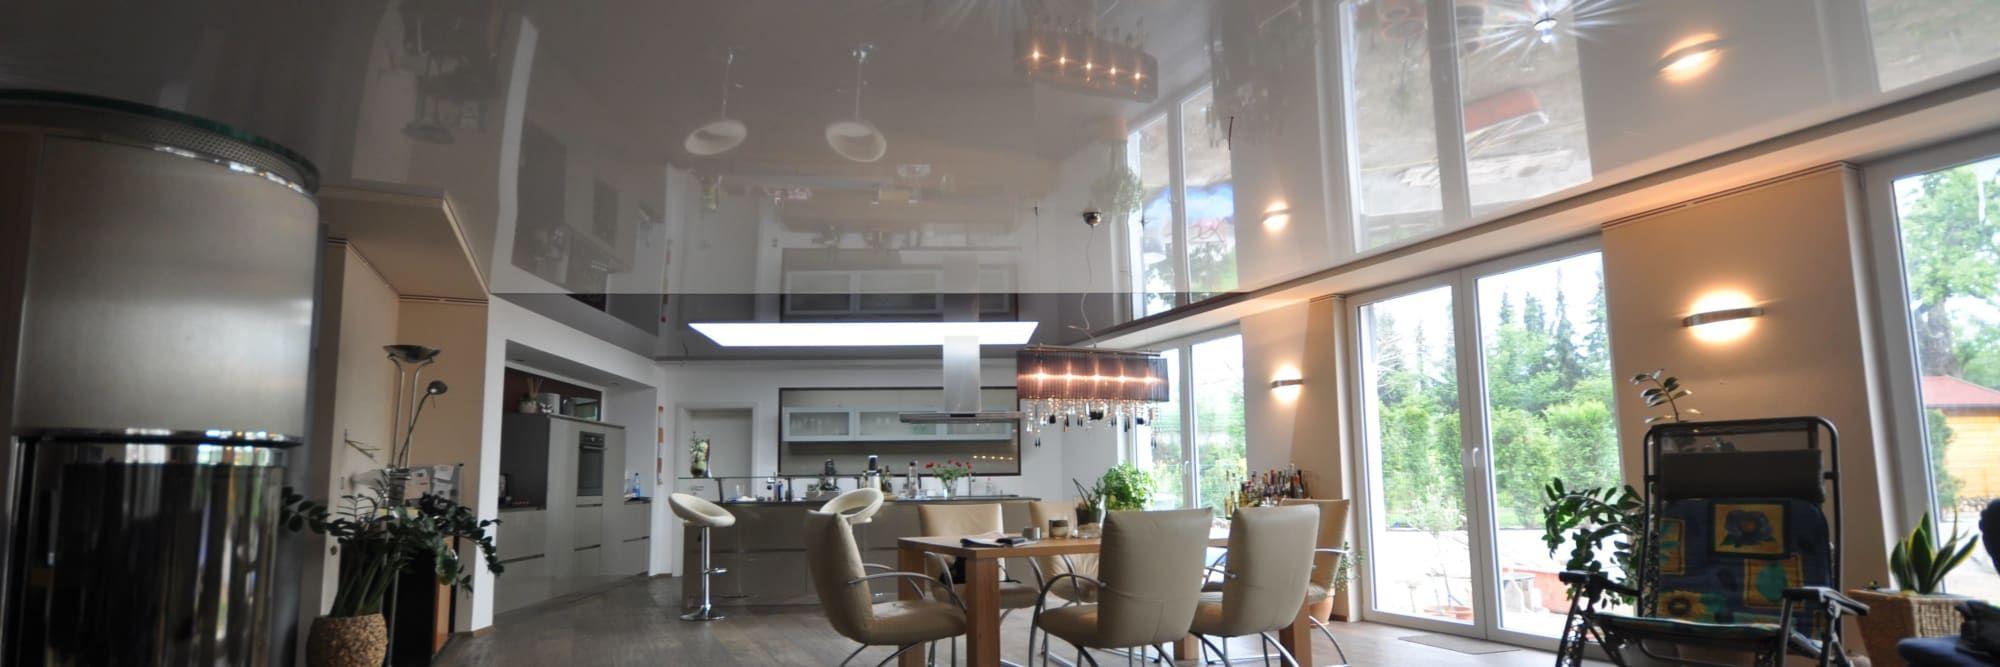 #wohnzimmer#style#decke#beleuchtung#led